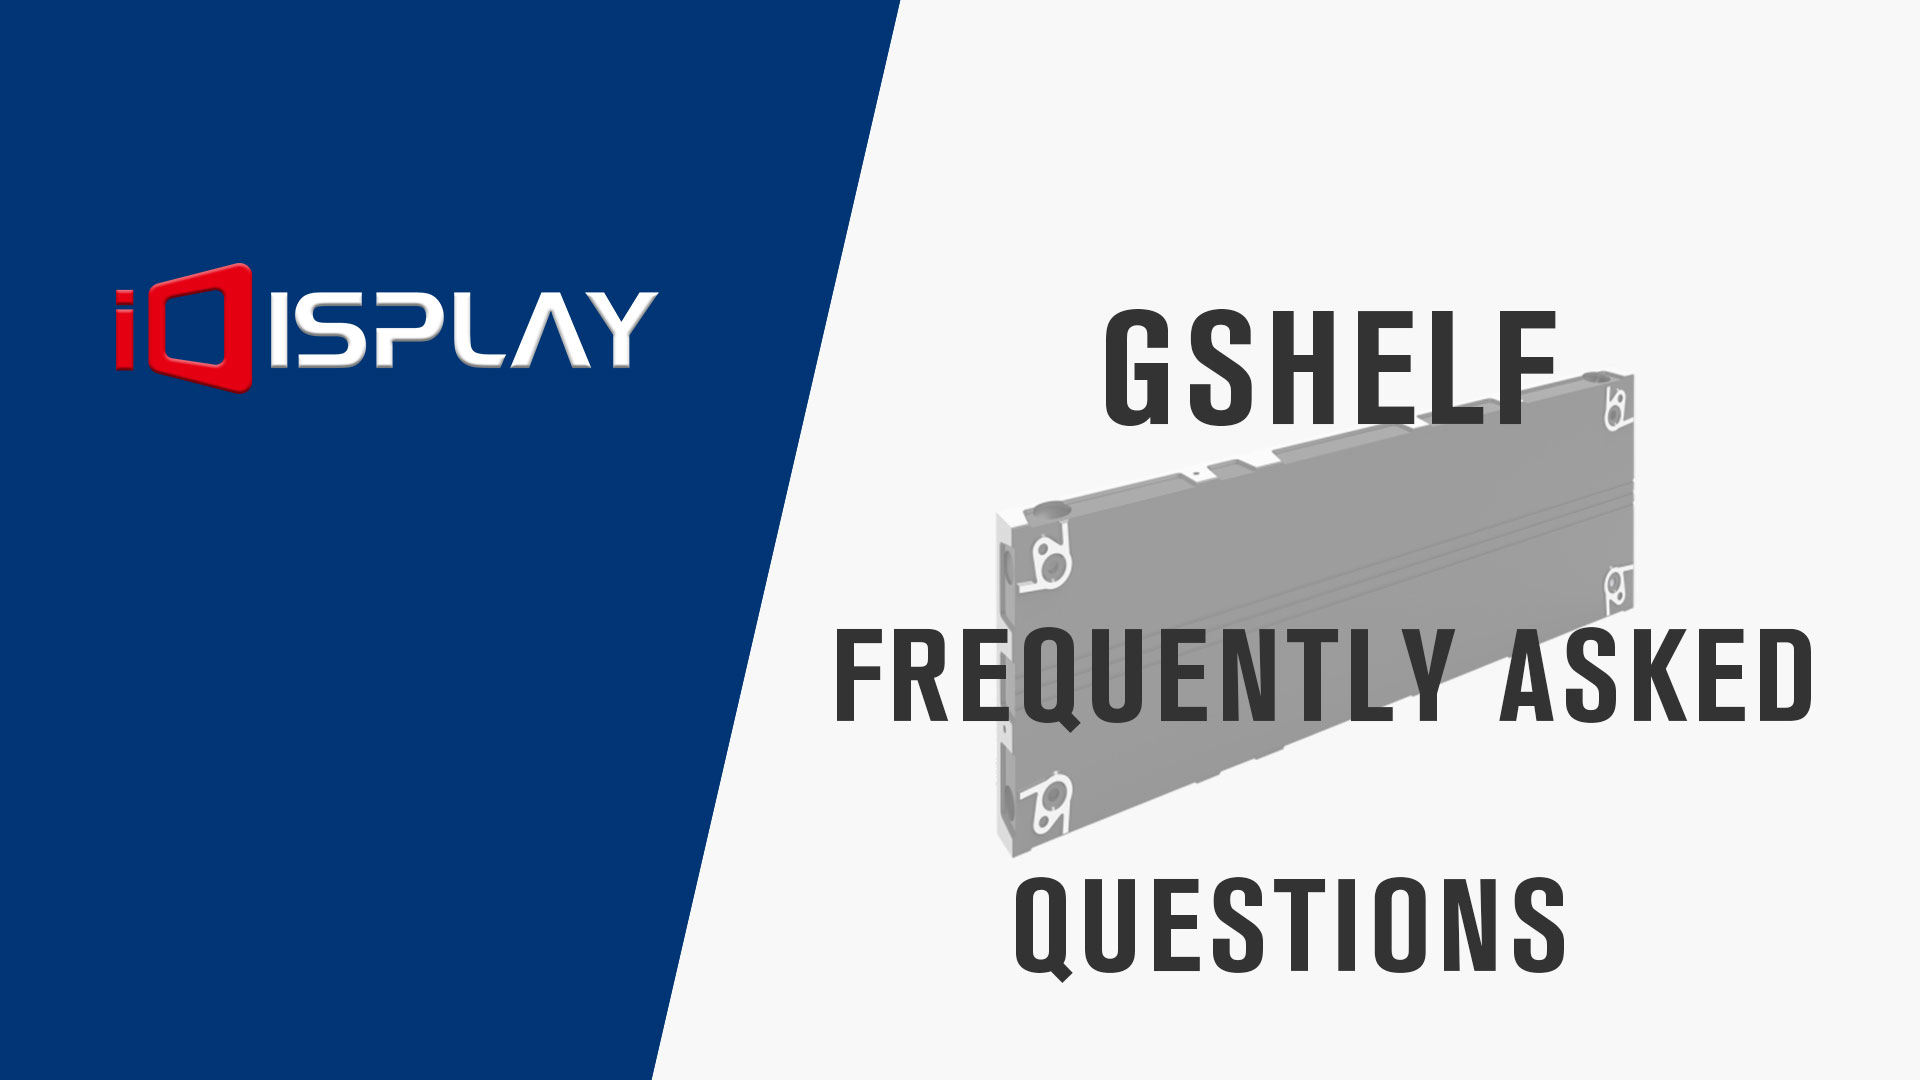 FAQ of Gshelf